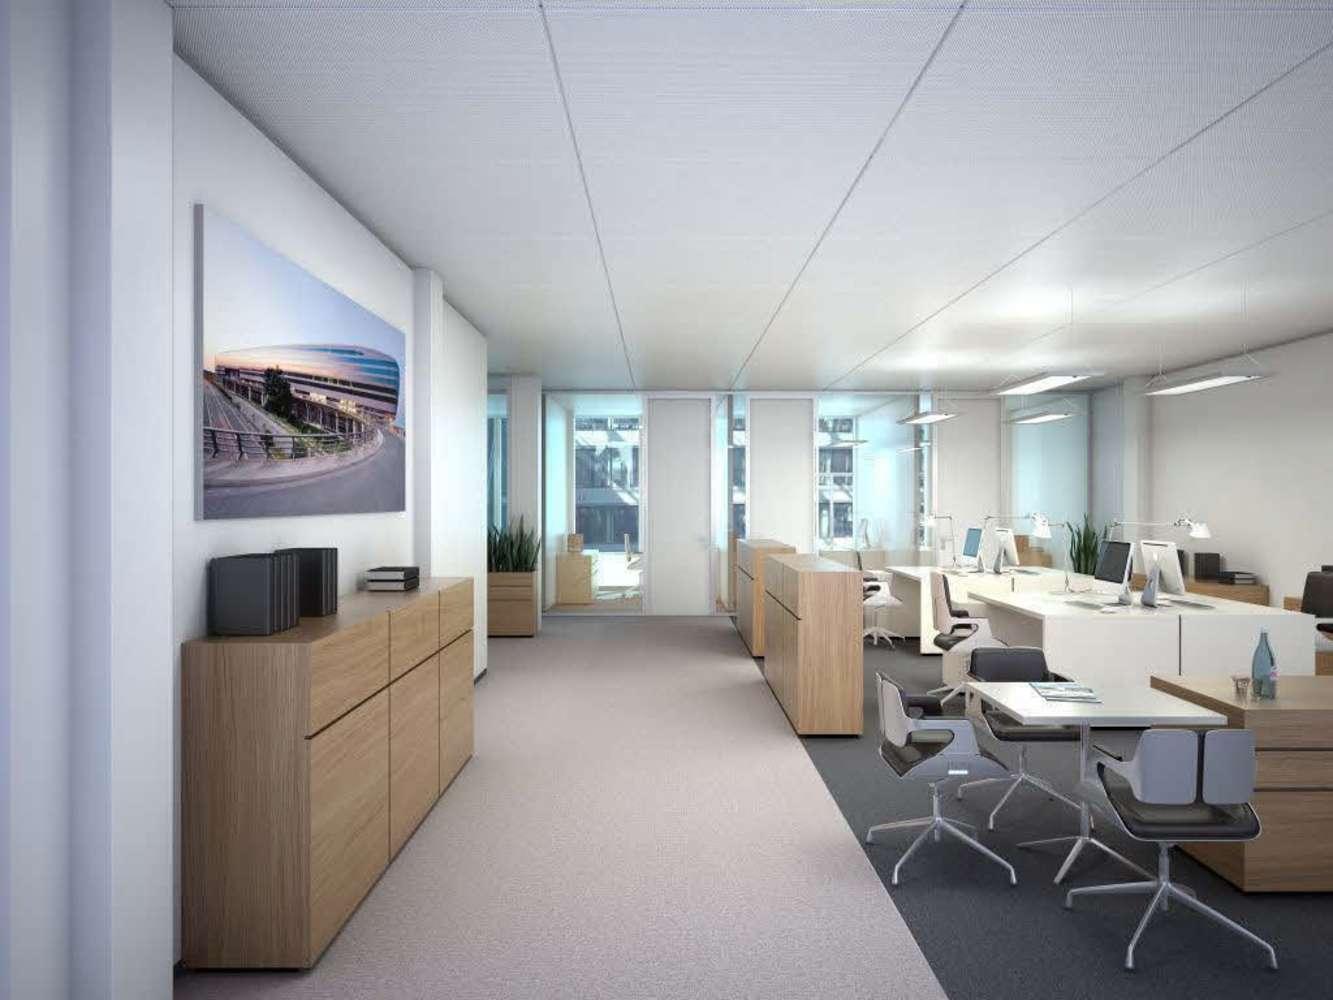 Büros Frankfurt am main, 60549 - Büro - Frankfurt am Main, Flughafen - F2320 - 9510644